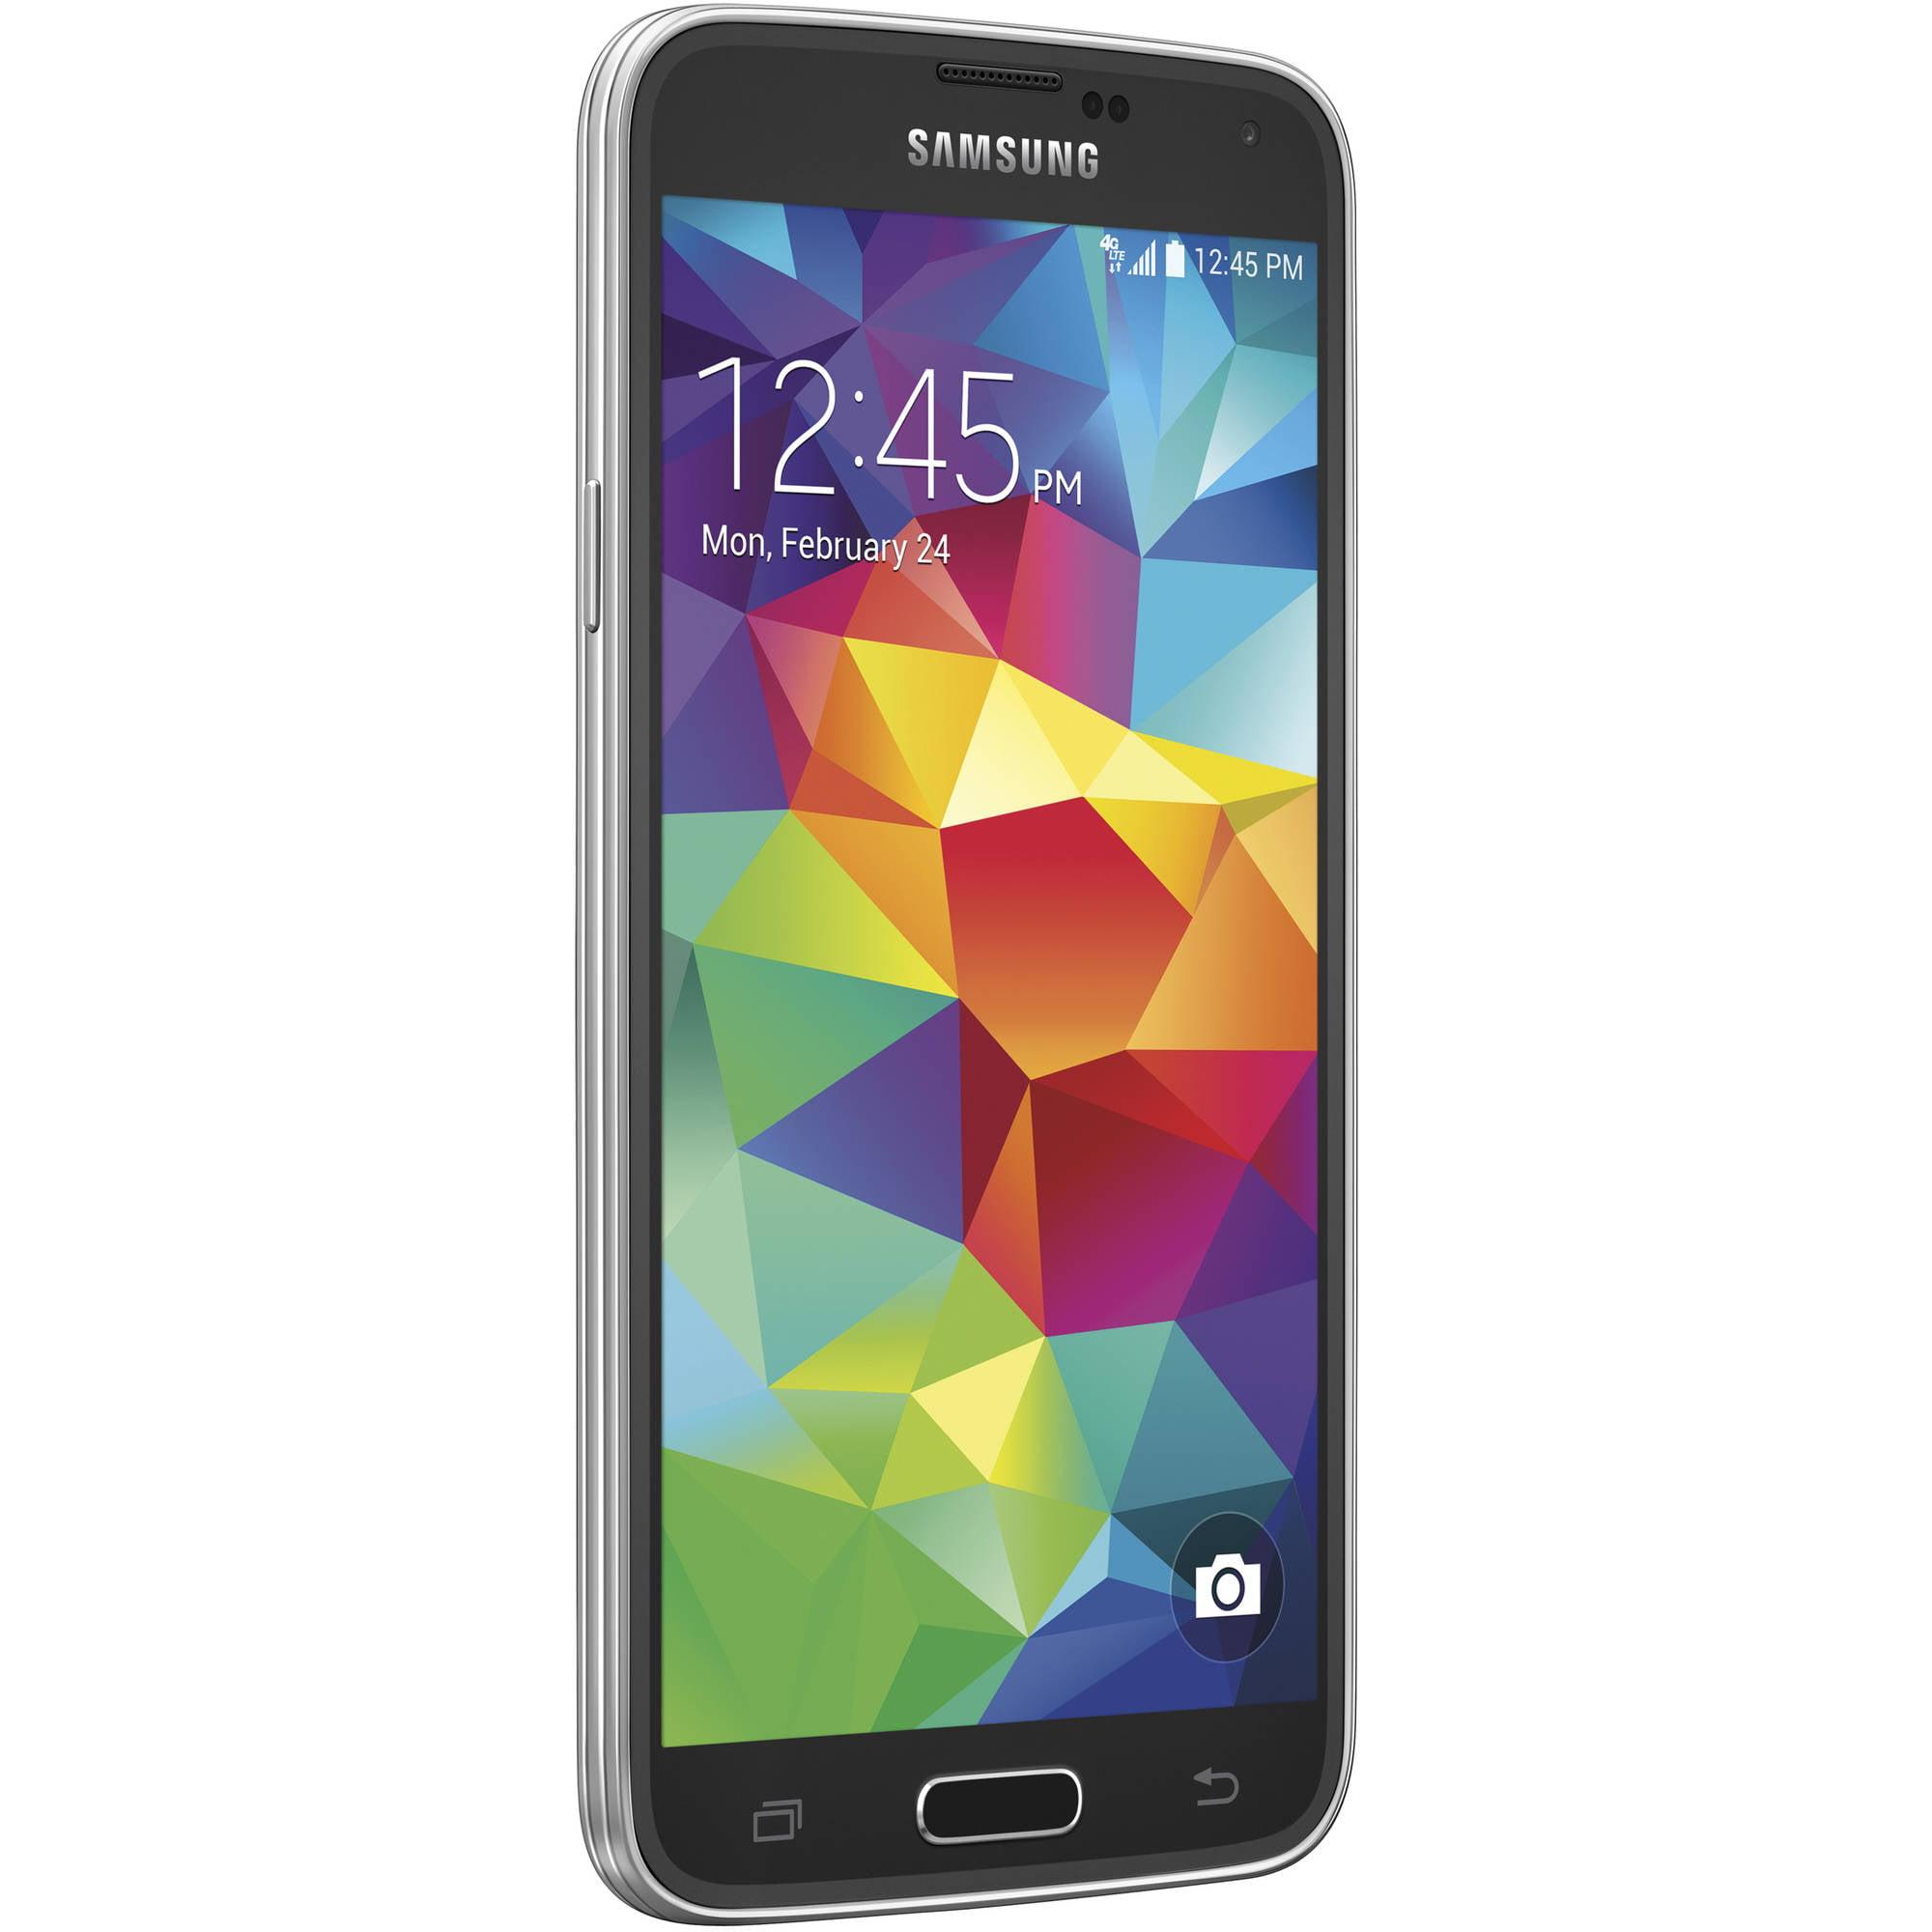 T-Mobile Samsung Galaxy S5 Prepaid Smartphone